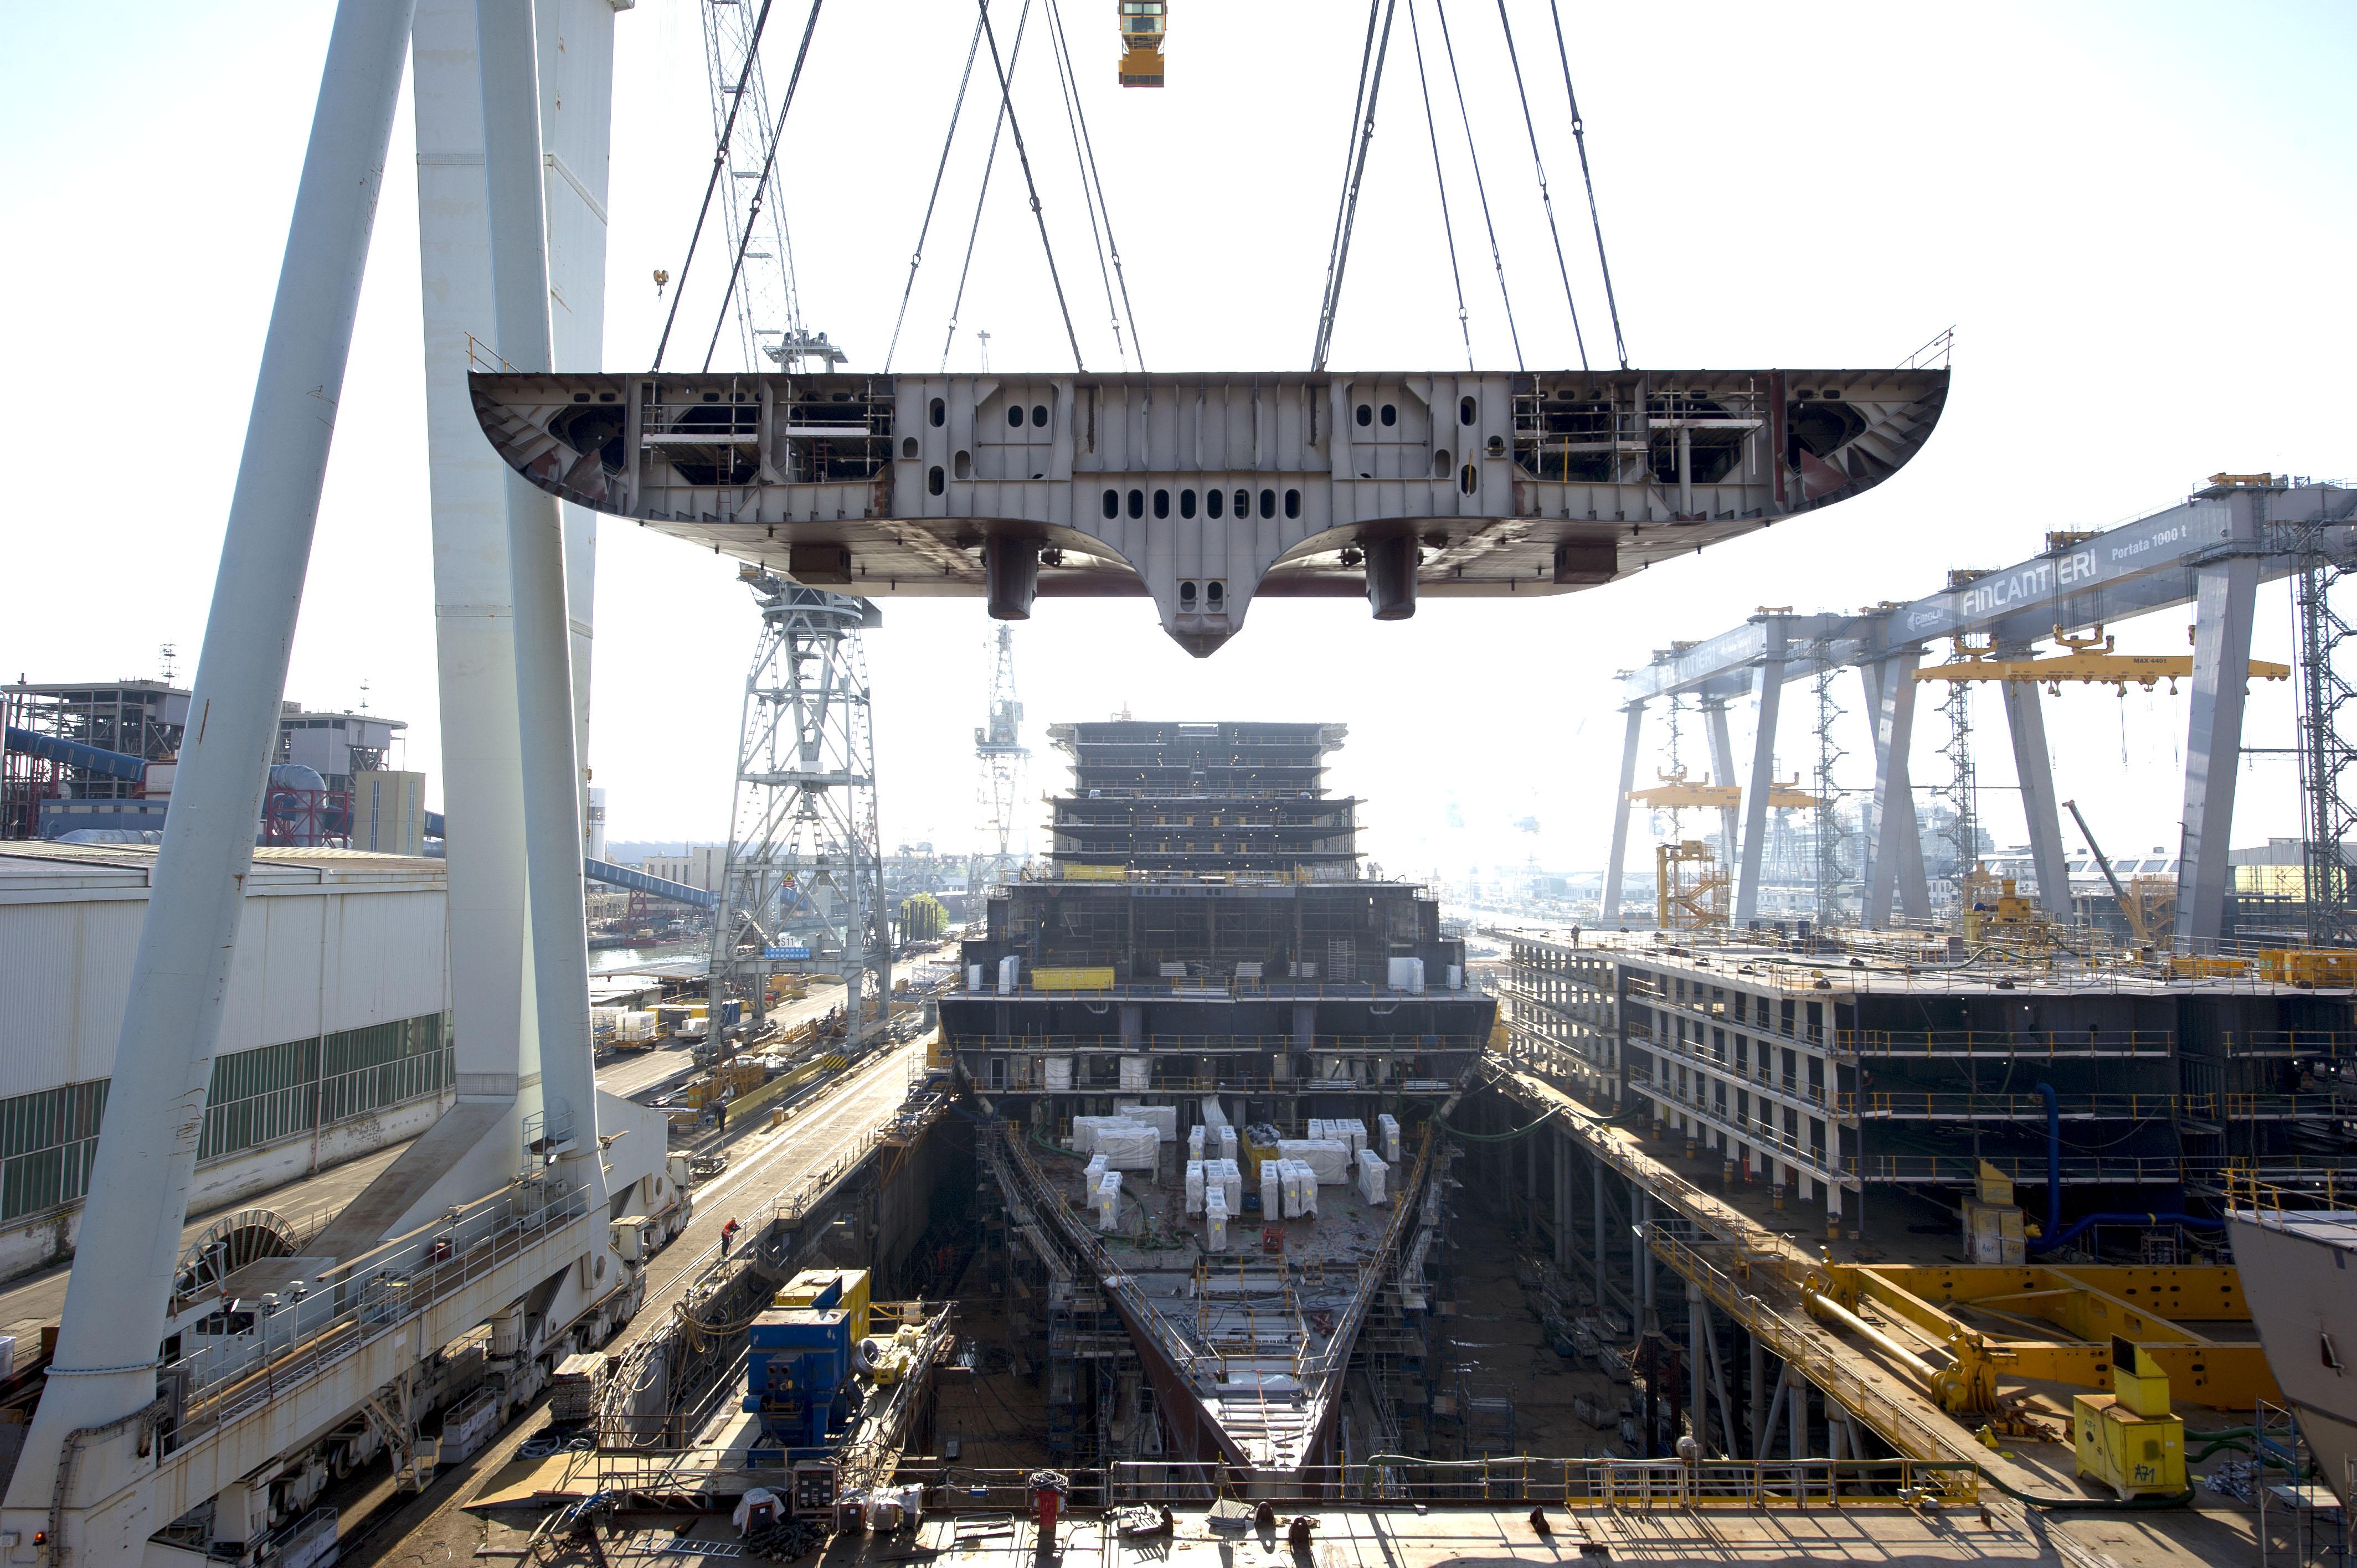 Building Britannia Britainu2019s Largest Cruise Ship U2013 Progress Photo Blog | CruiseMiss Cruise Blog